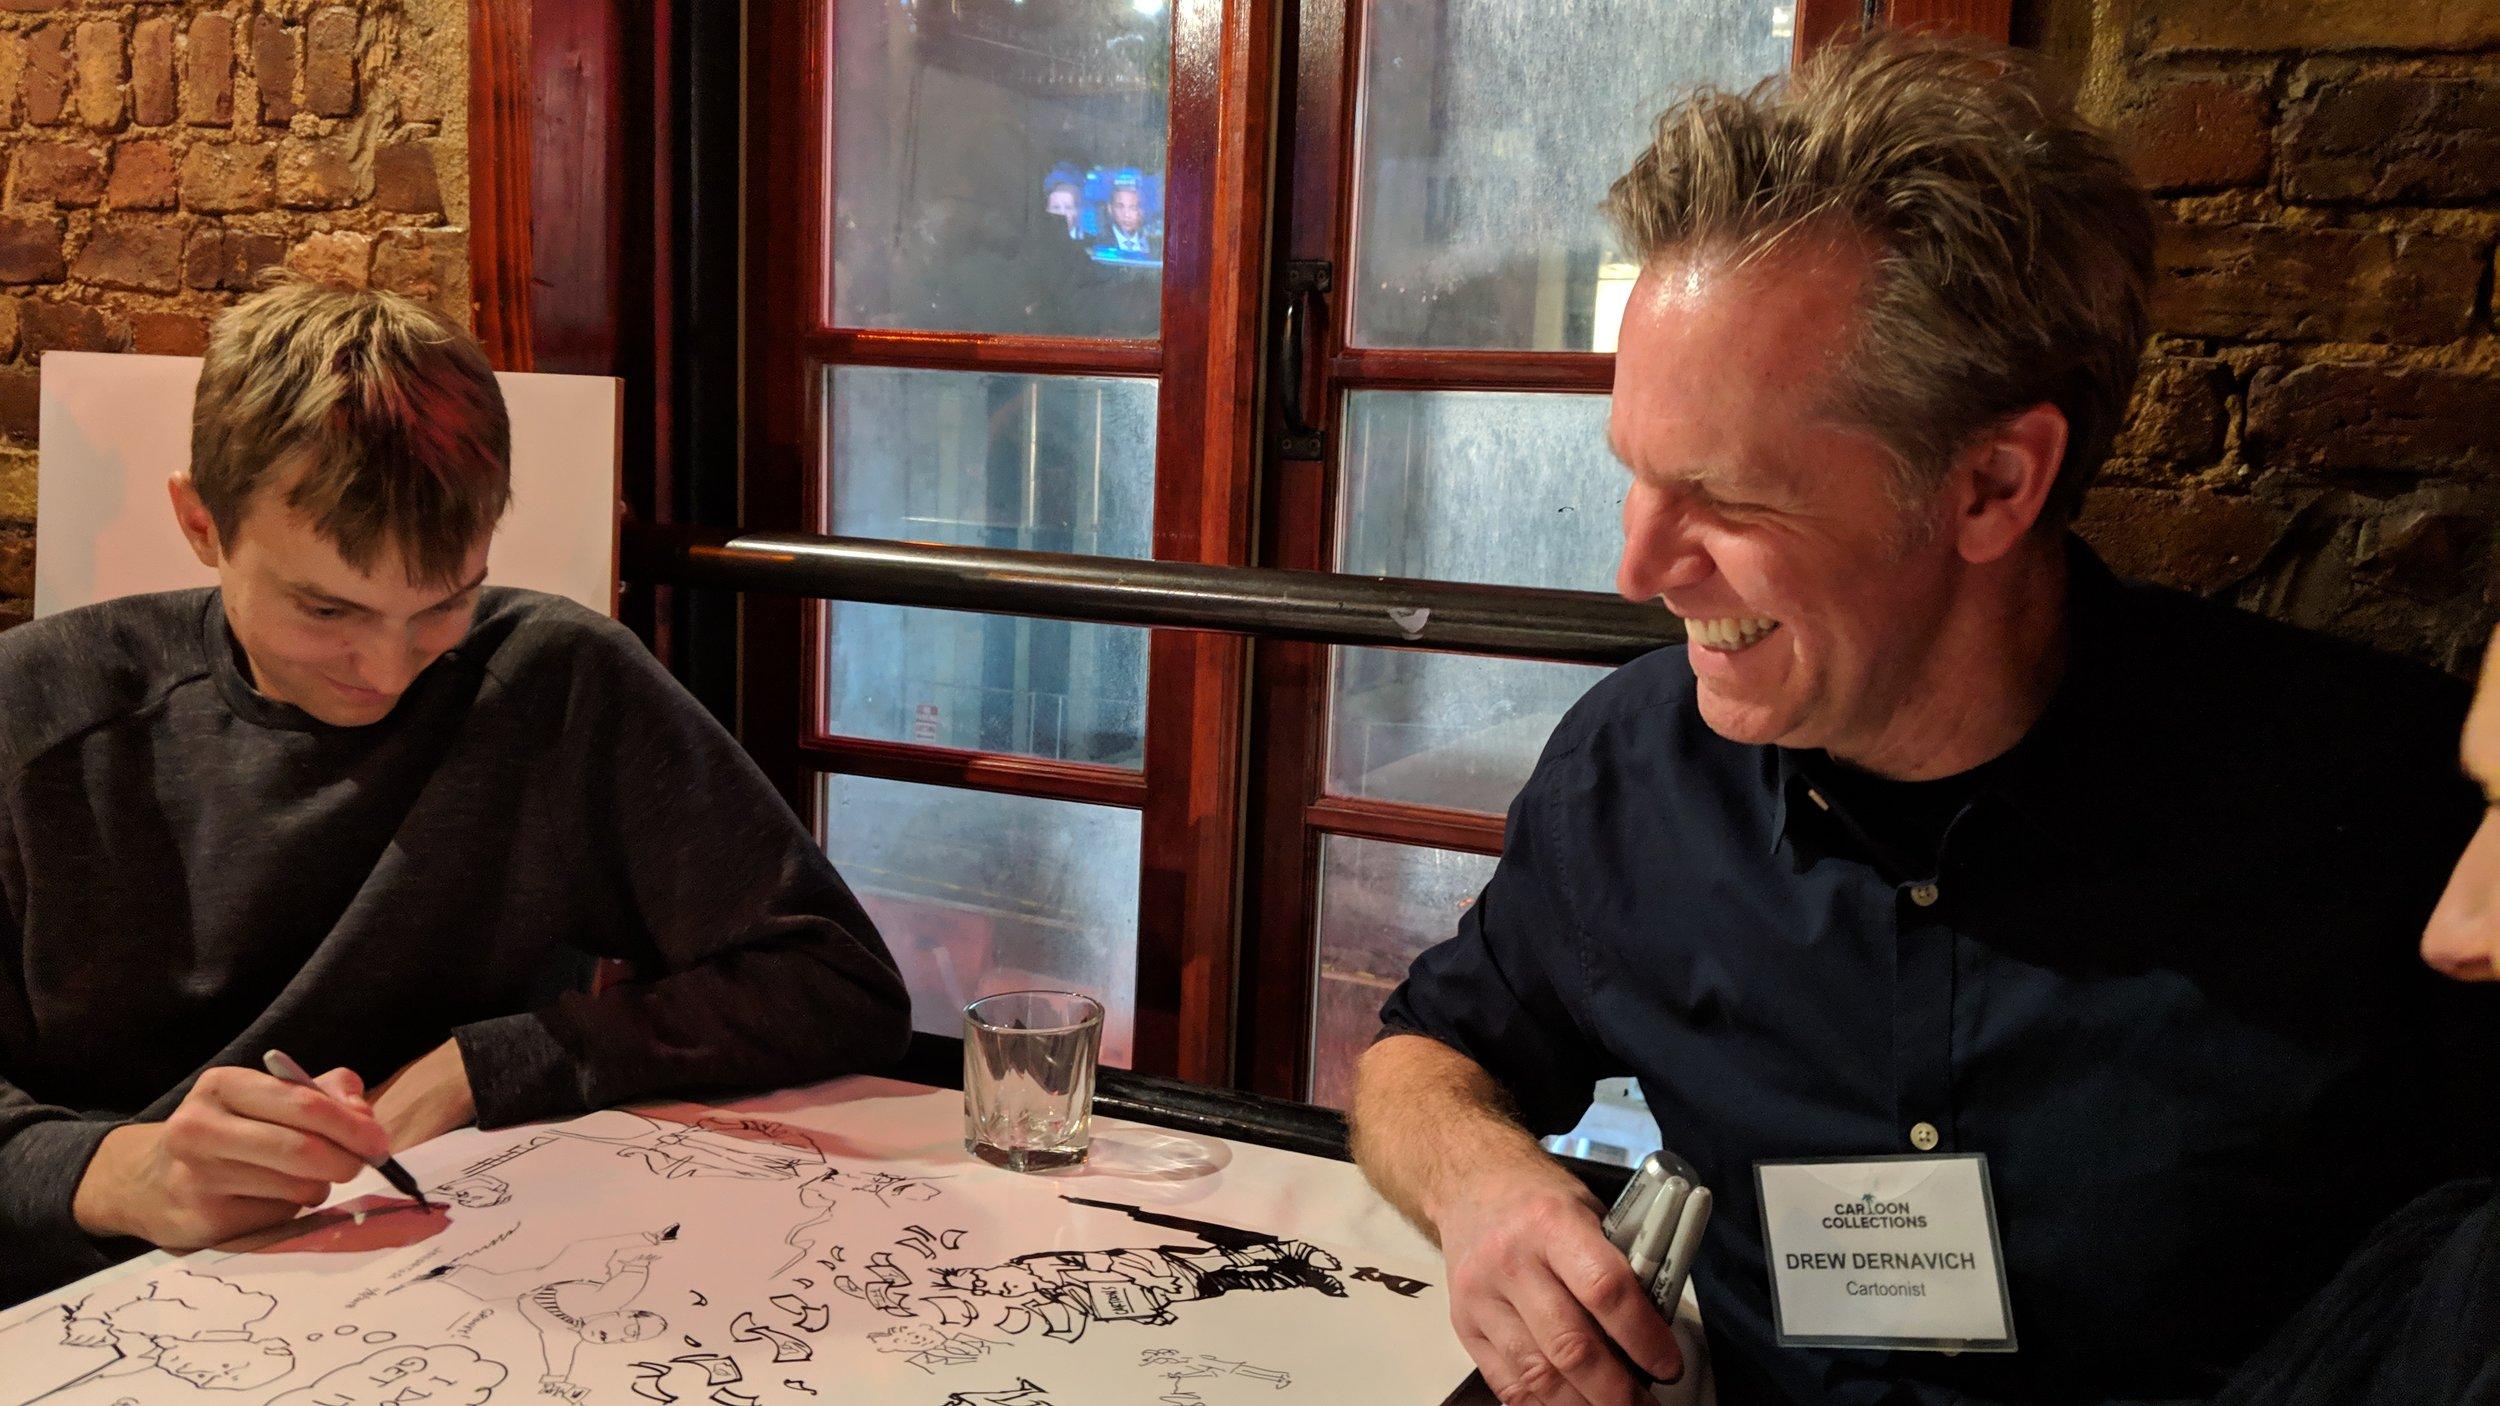 Ed Steed (left) draws Drew Dernavich (right)